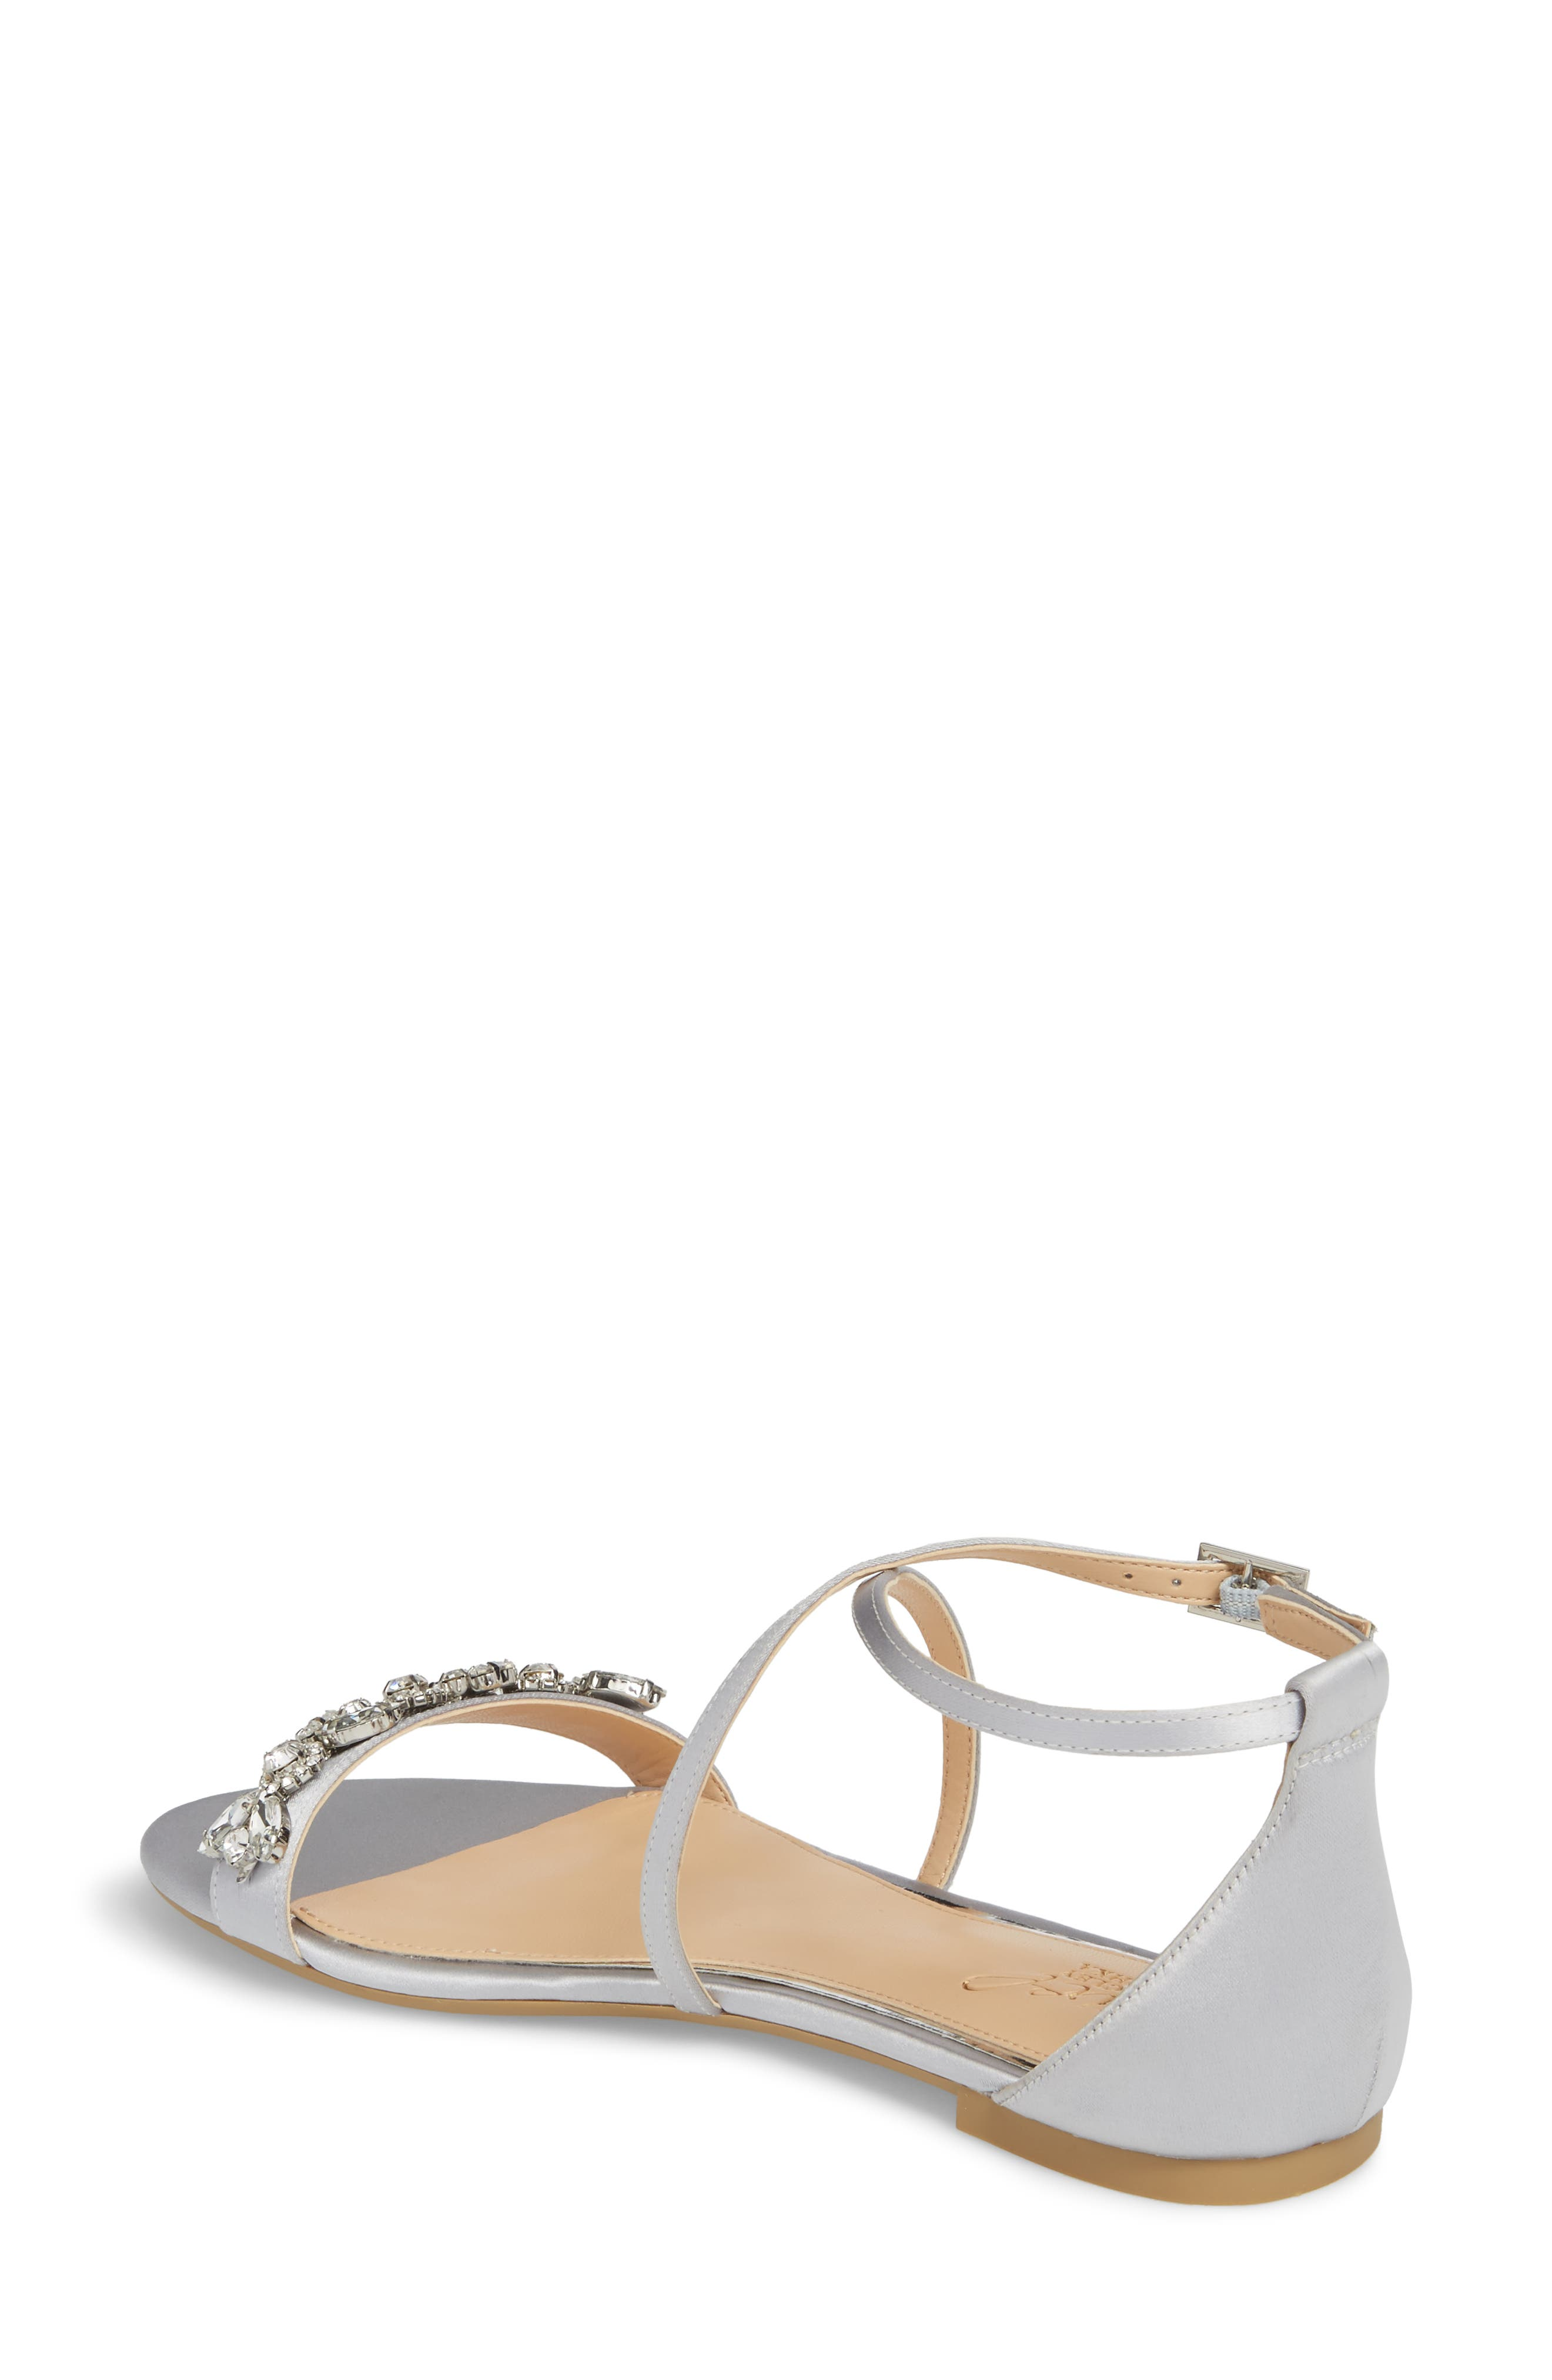 Alternate Image 2  - Jewel Badgley Mischka Tessy Embellished Sandal (Women)